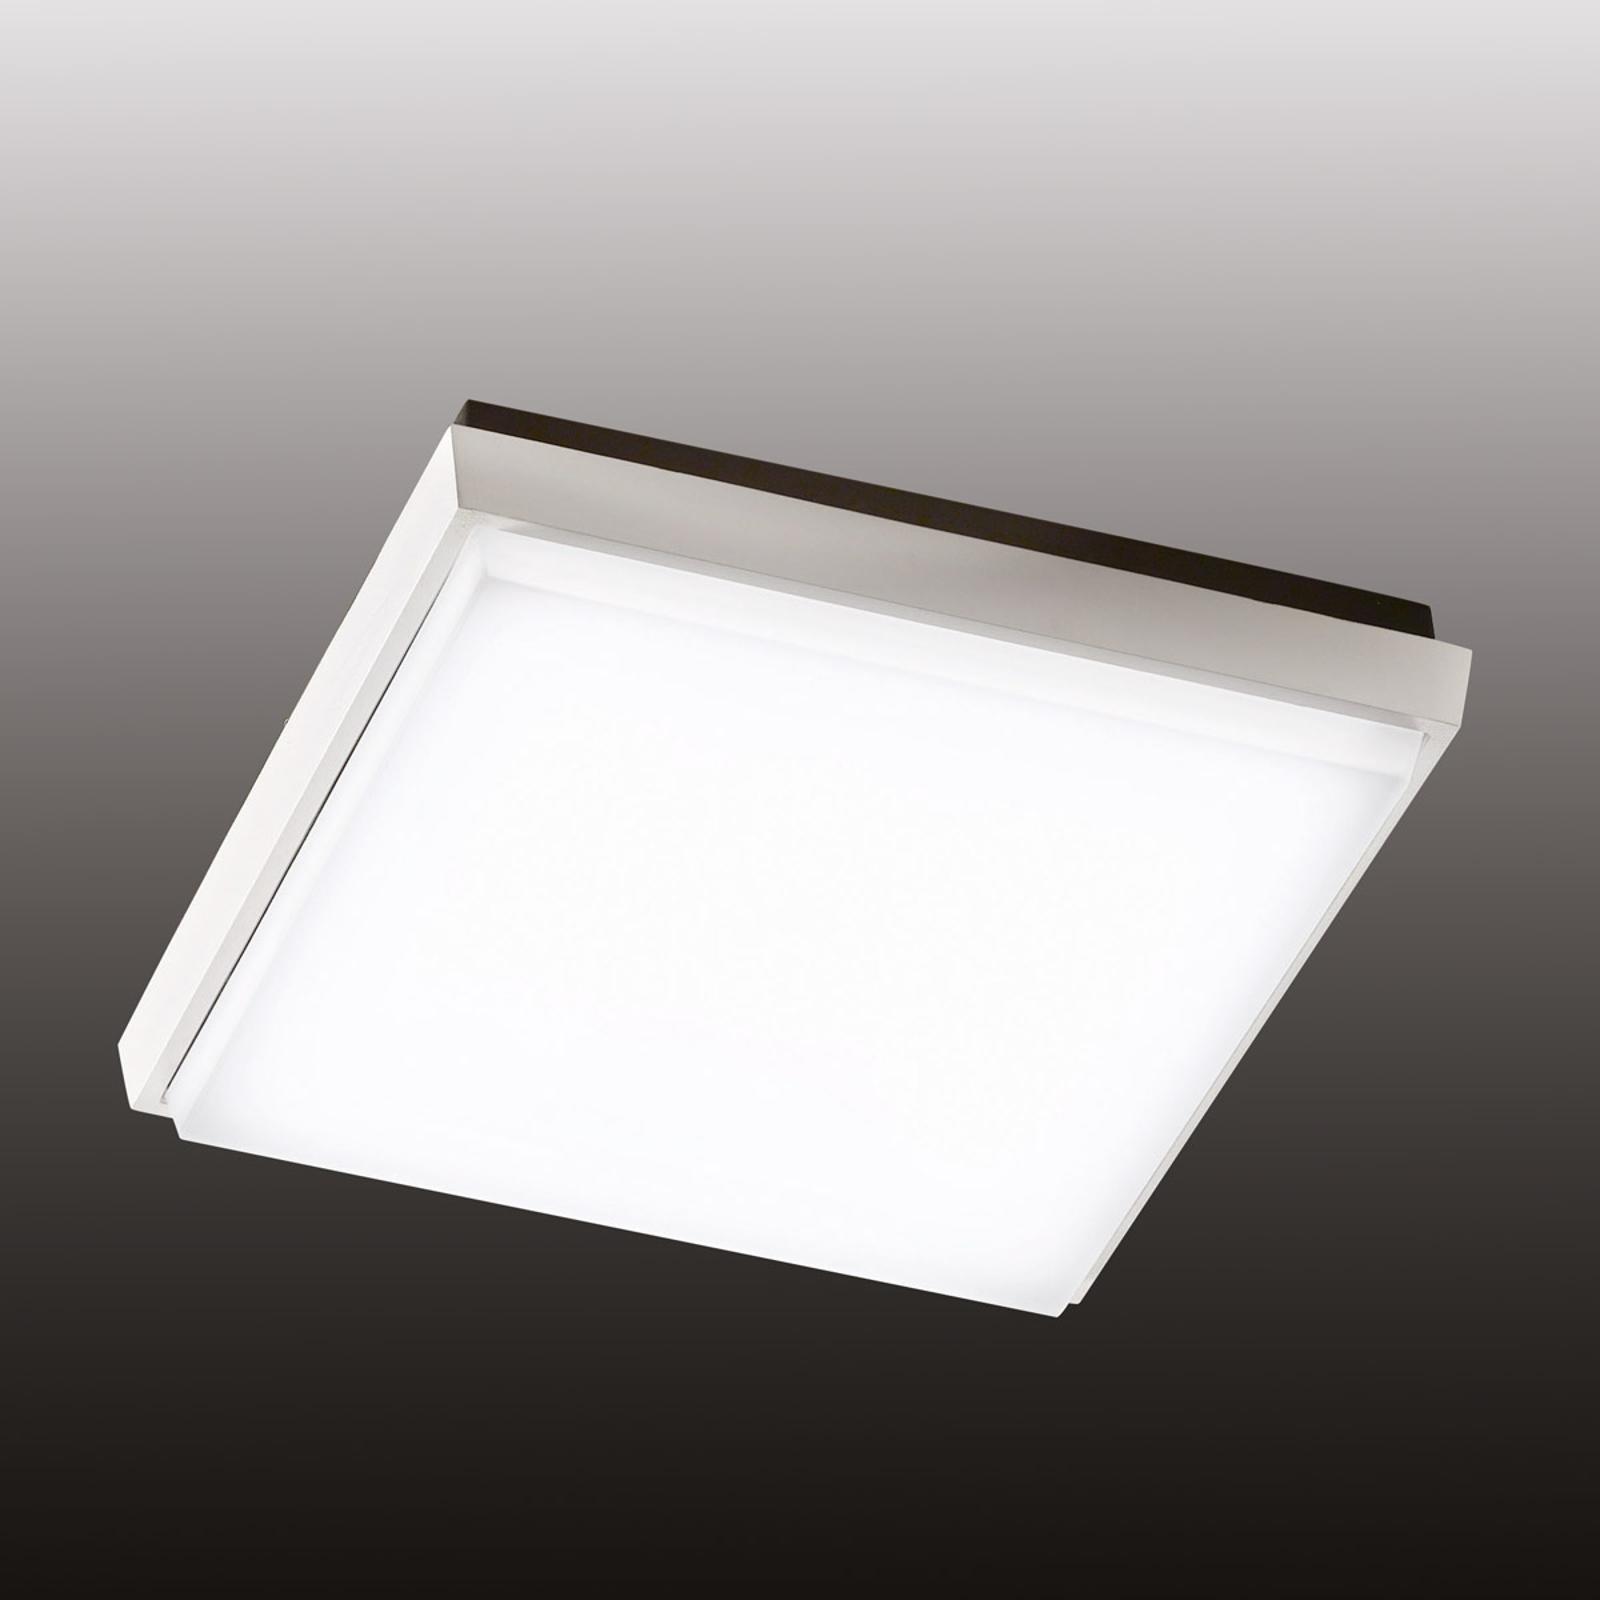 Kwadratowa lampa sufitowa zewnętrzna LED Desdy